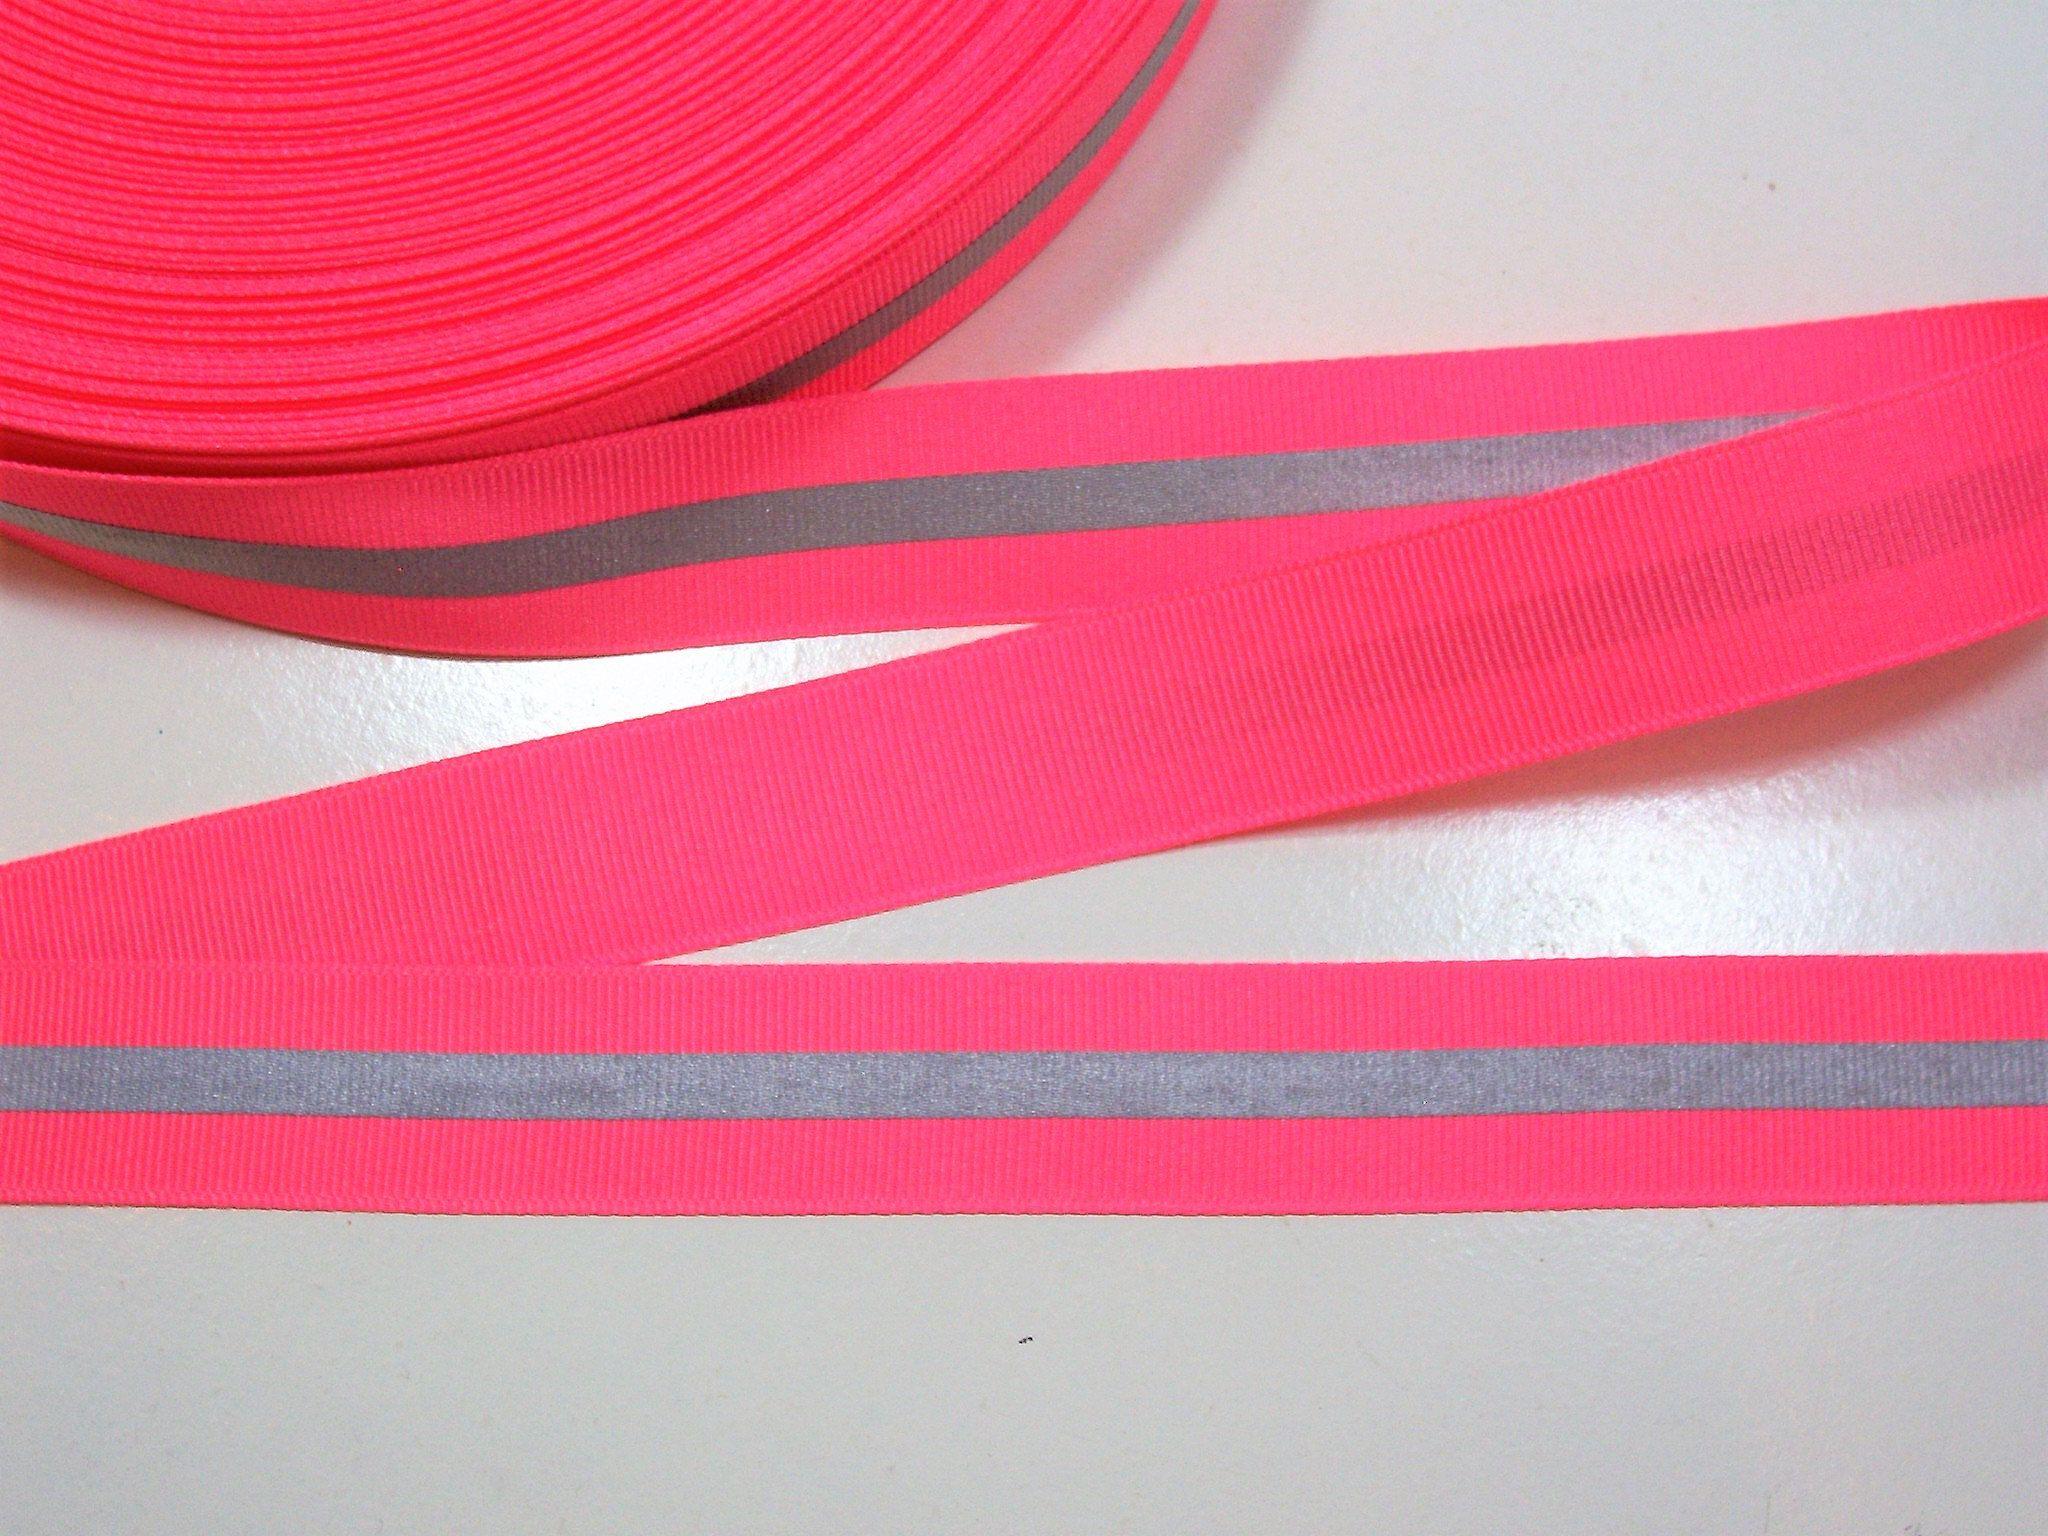 Neon Pink Ribbon Pink With Gray Stripe Grosgrain Ribbon 7 8 Inch